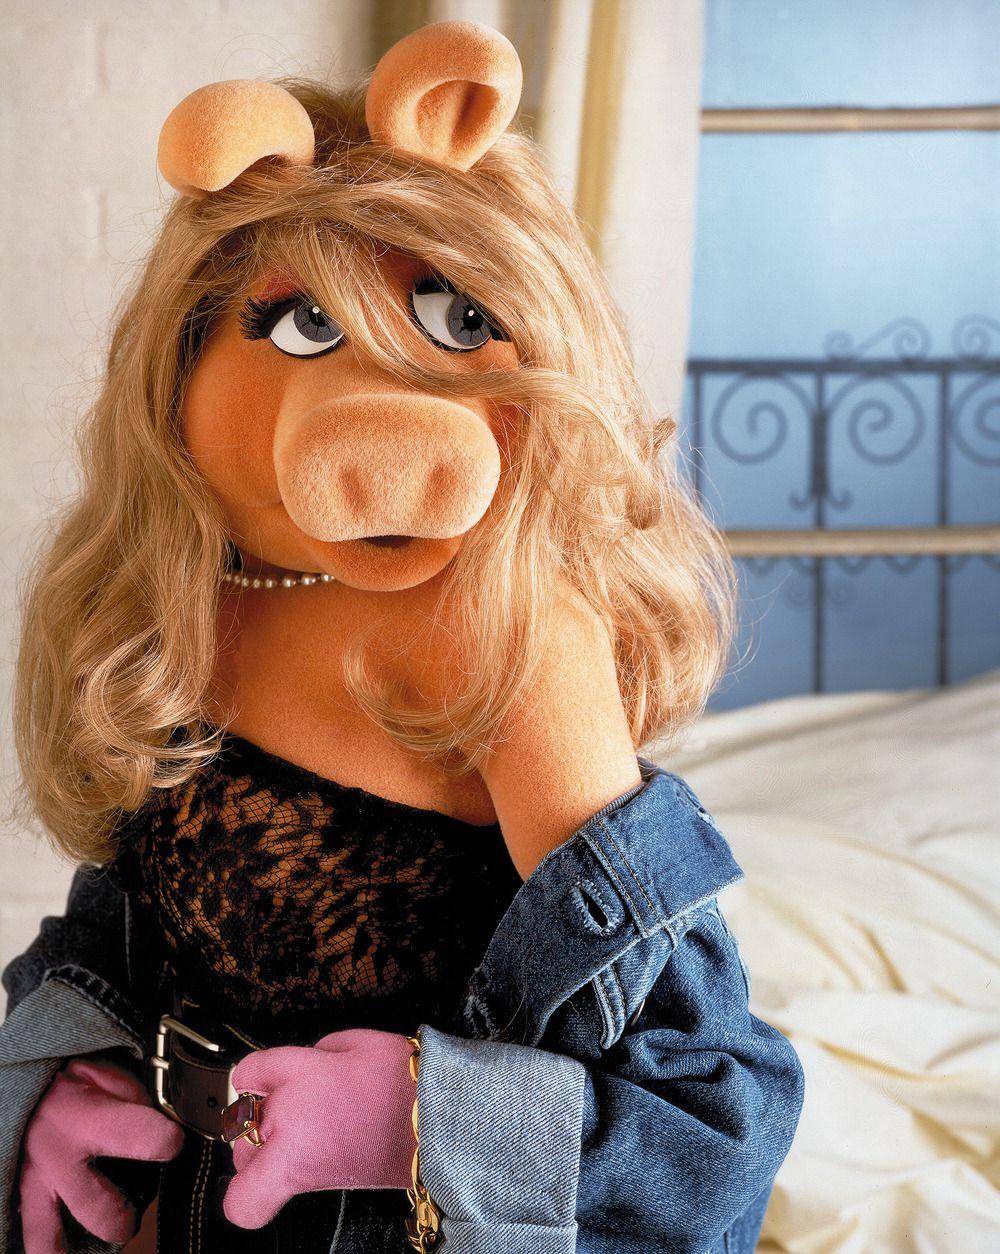 Miss Piggy Photo by John E Barrett